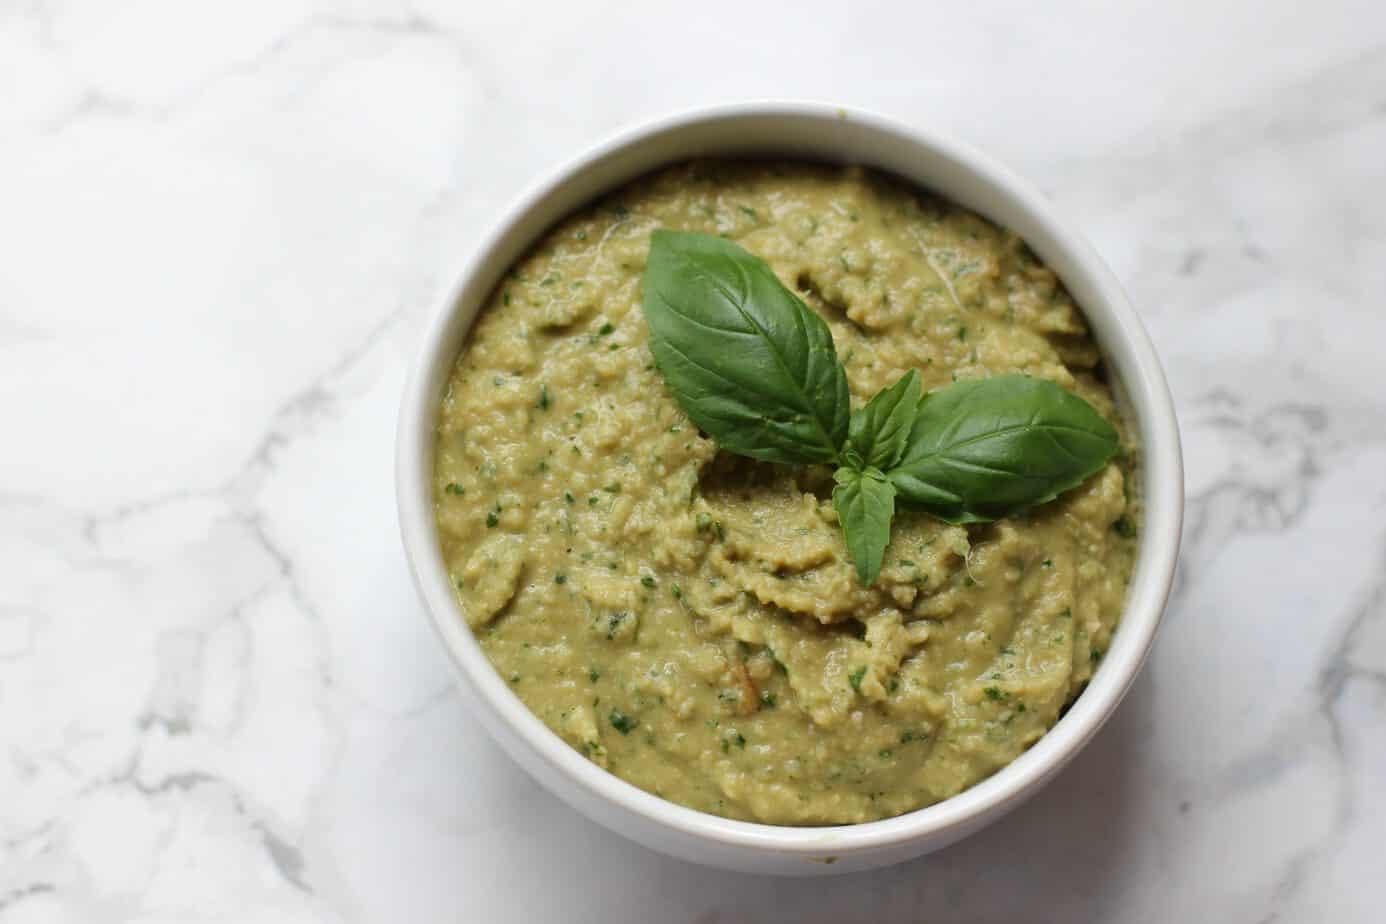 Zoe S Kitchen Pesto Hummus Recipe